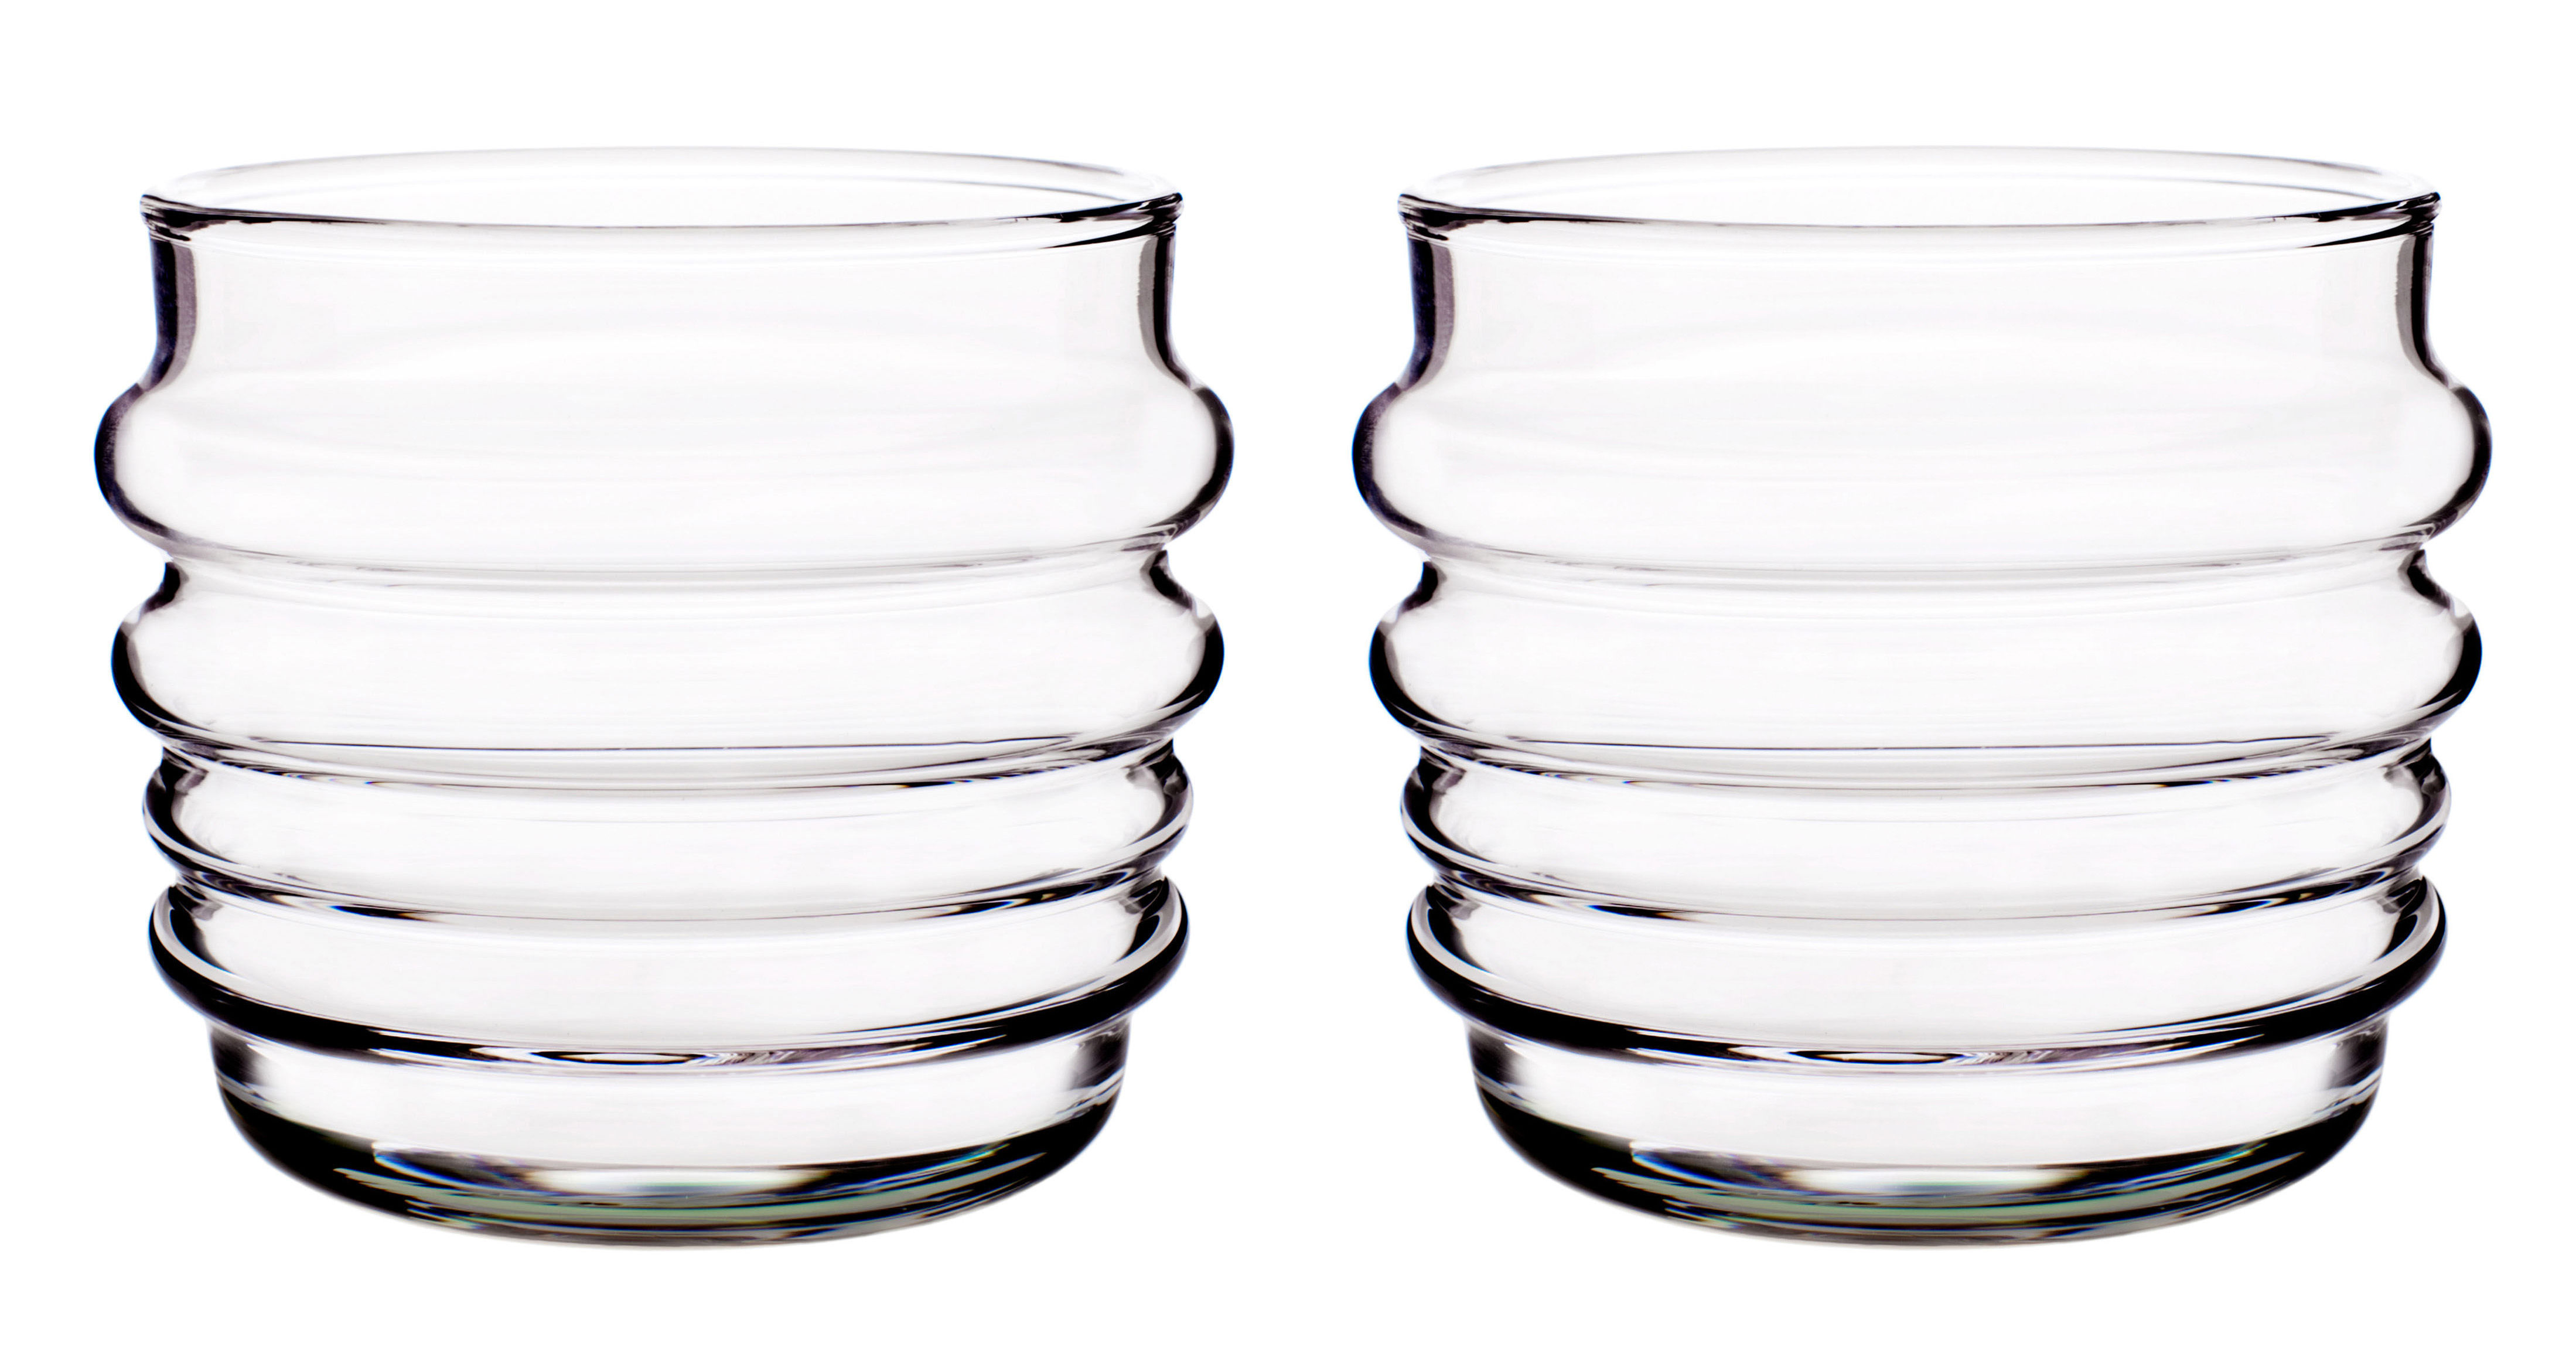 Tischkultur - Gläser - Sukat Makkaralla Glas / 2er-Set - Marimekko - Sukat Makkaralla - Transparent - mundgeblasenes Glas